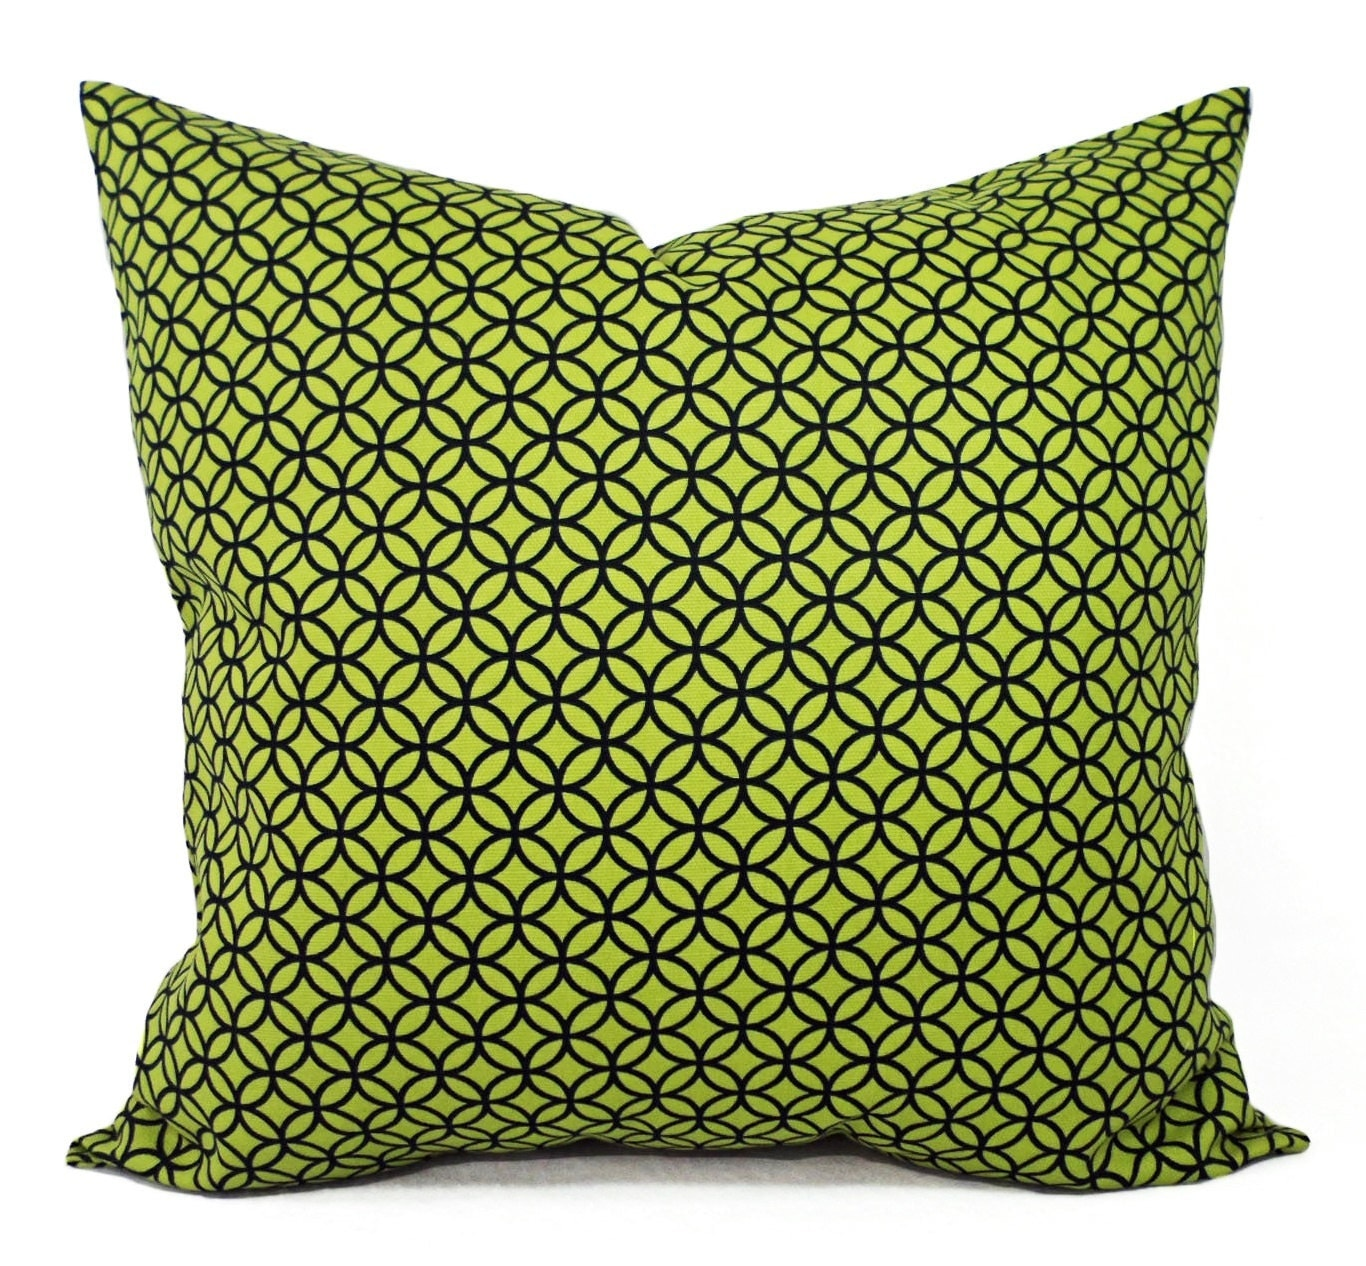 Decorative Throw Pillows Clearance : CLEARANCE Green Pillow Cover Decorative Pillow Cover